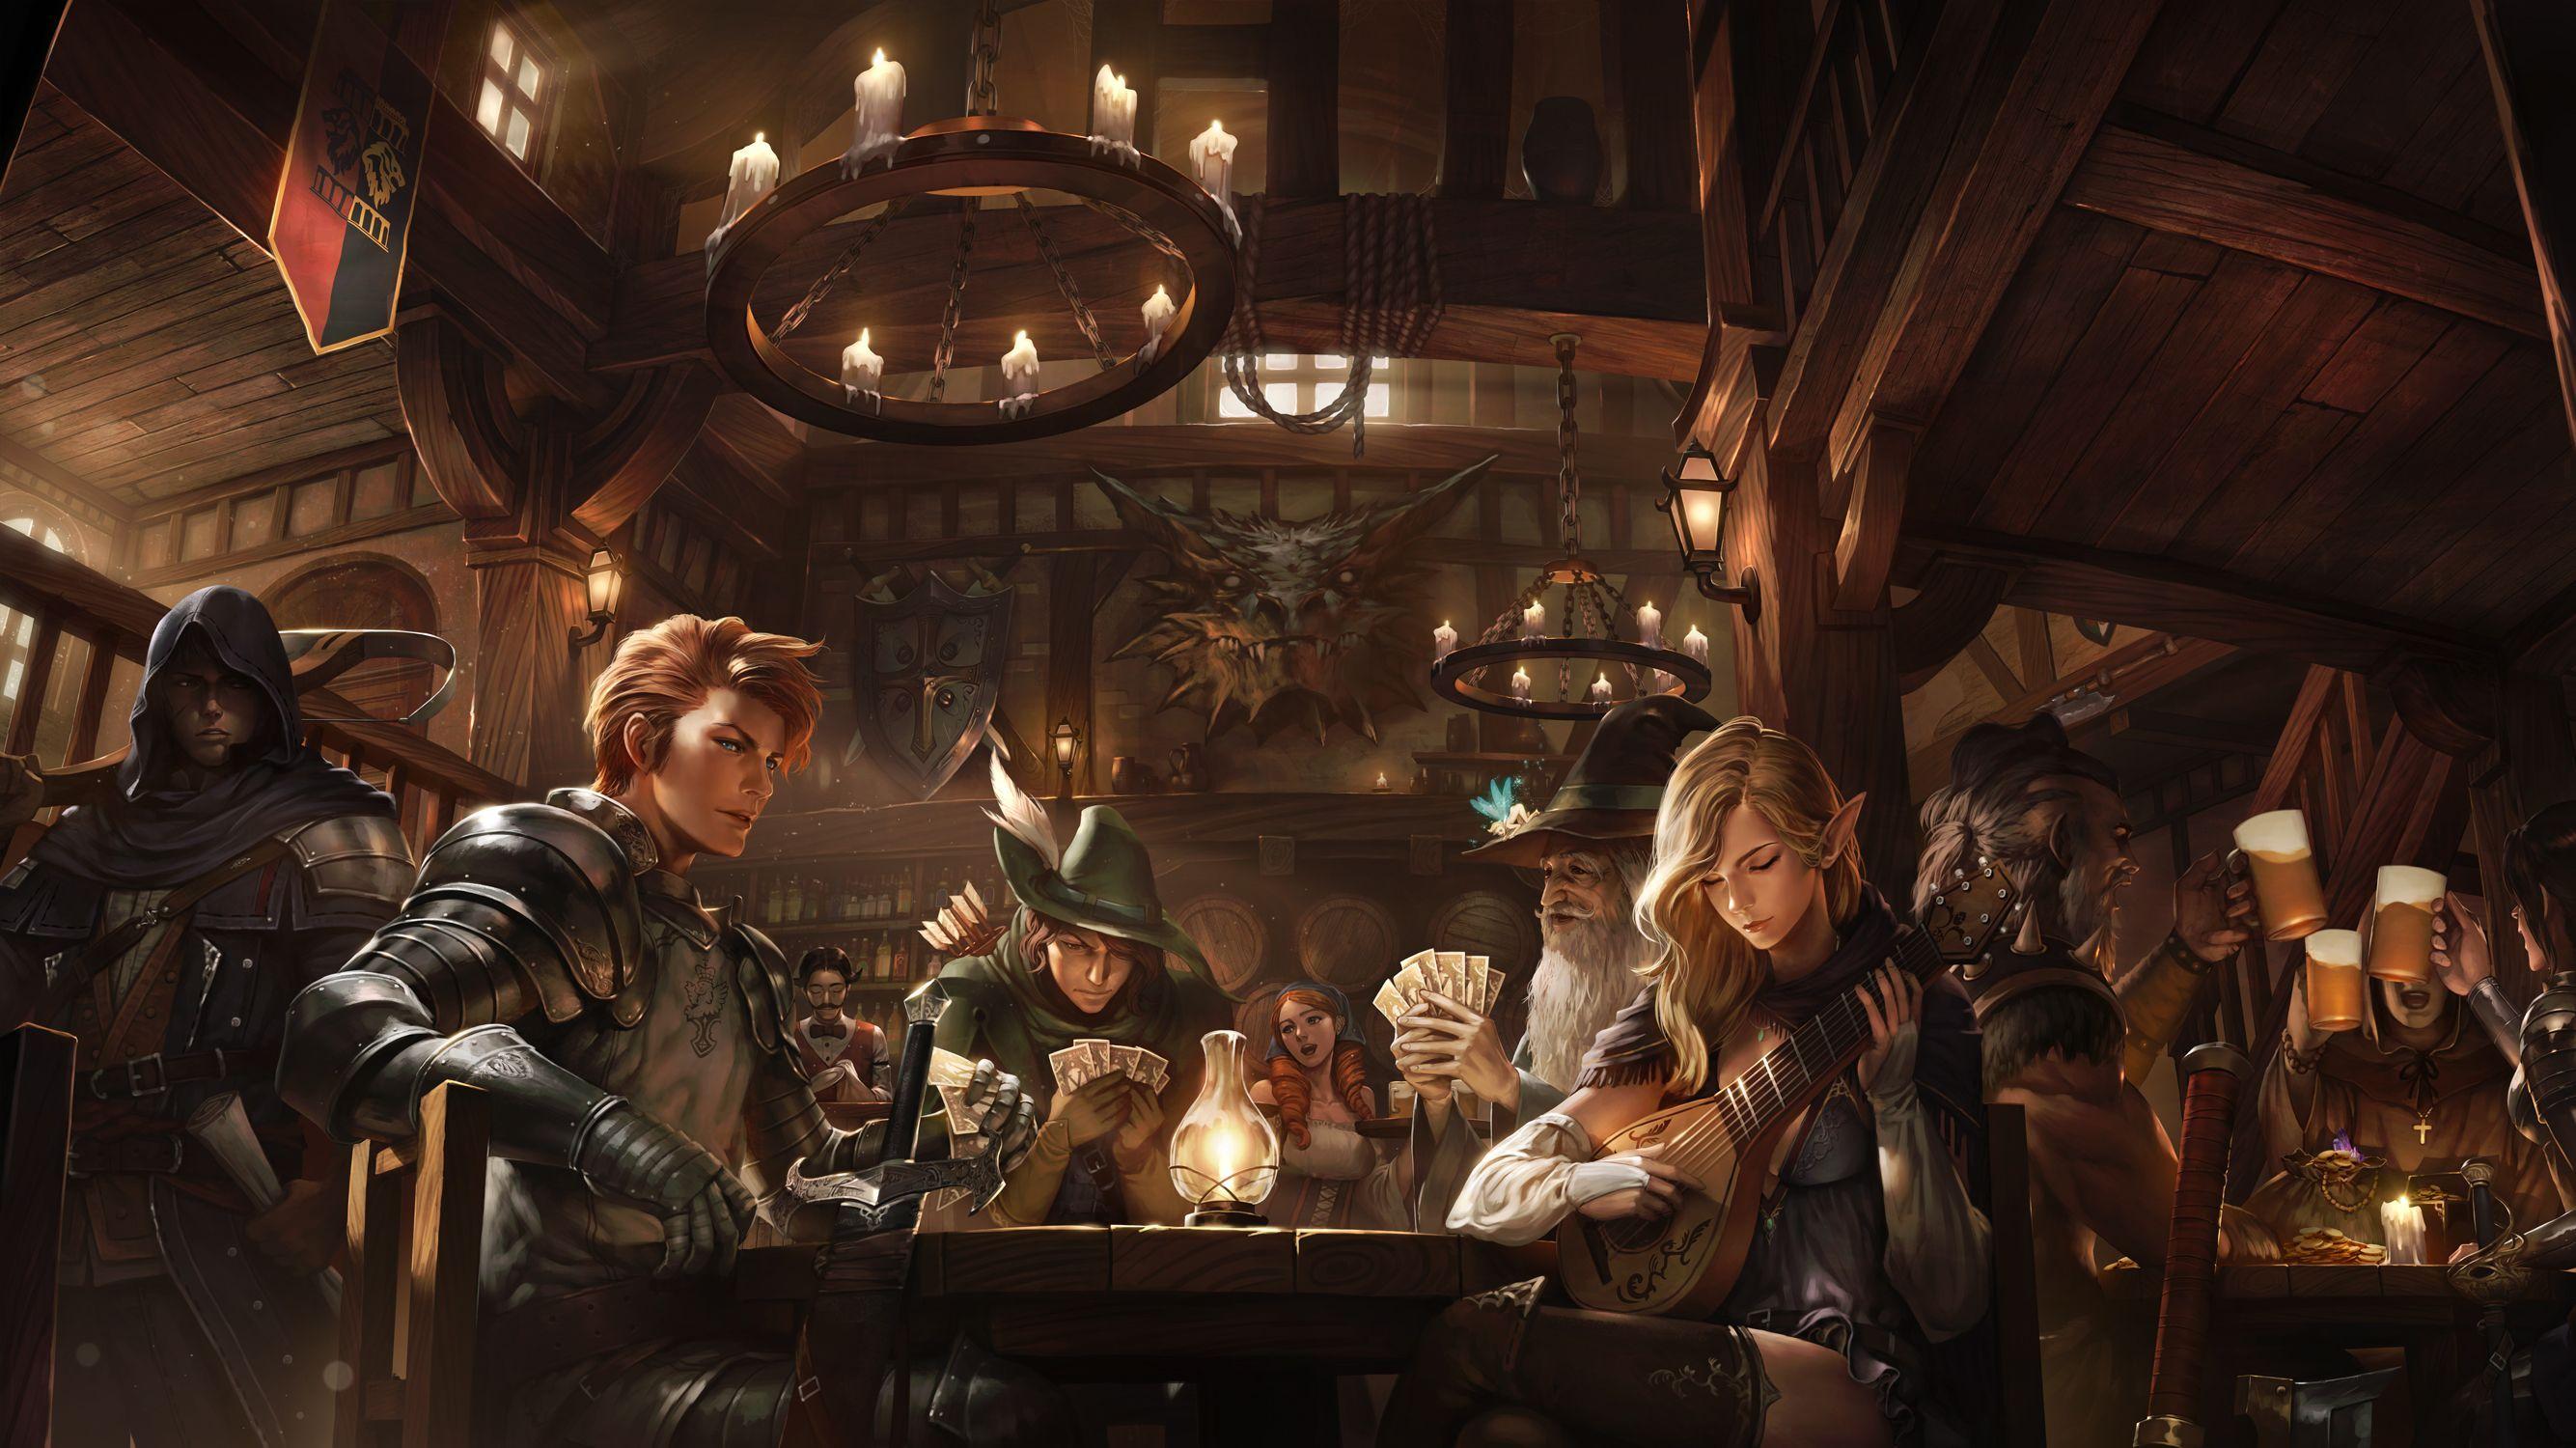 https://static1.thegamerimages.com/wordpress/wp-content/uploads/2019/09/DD-tavern.jpg